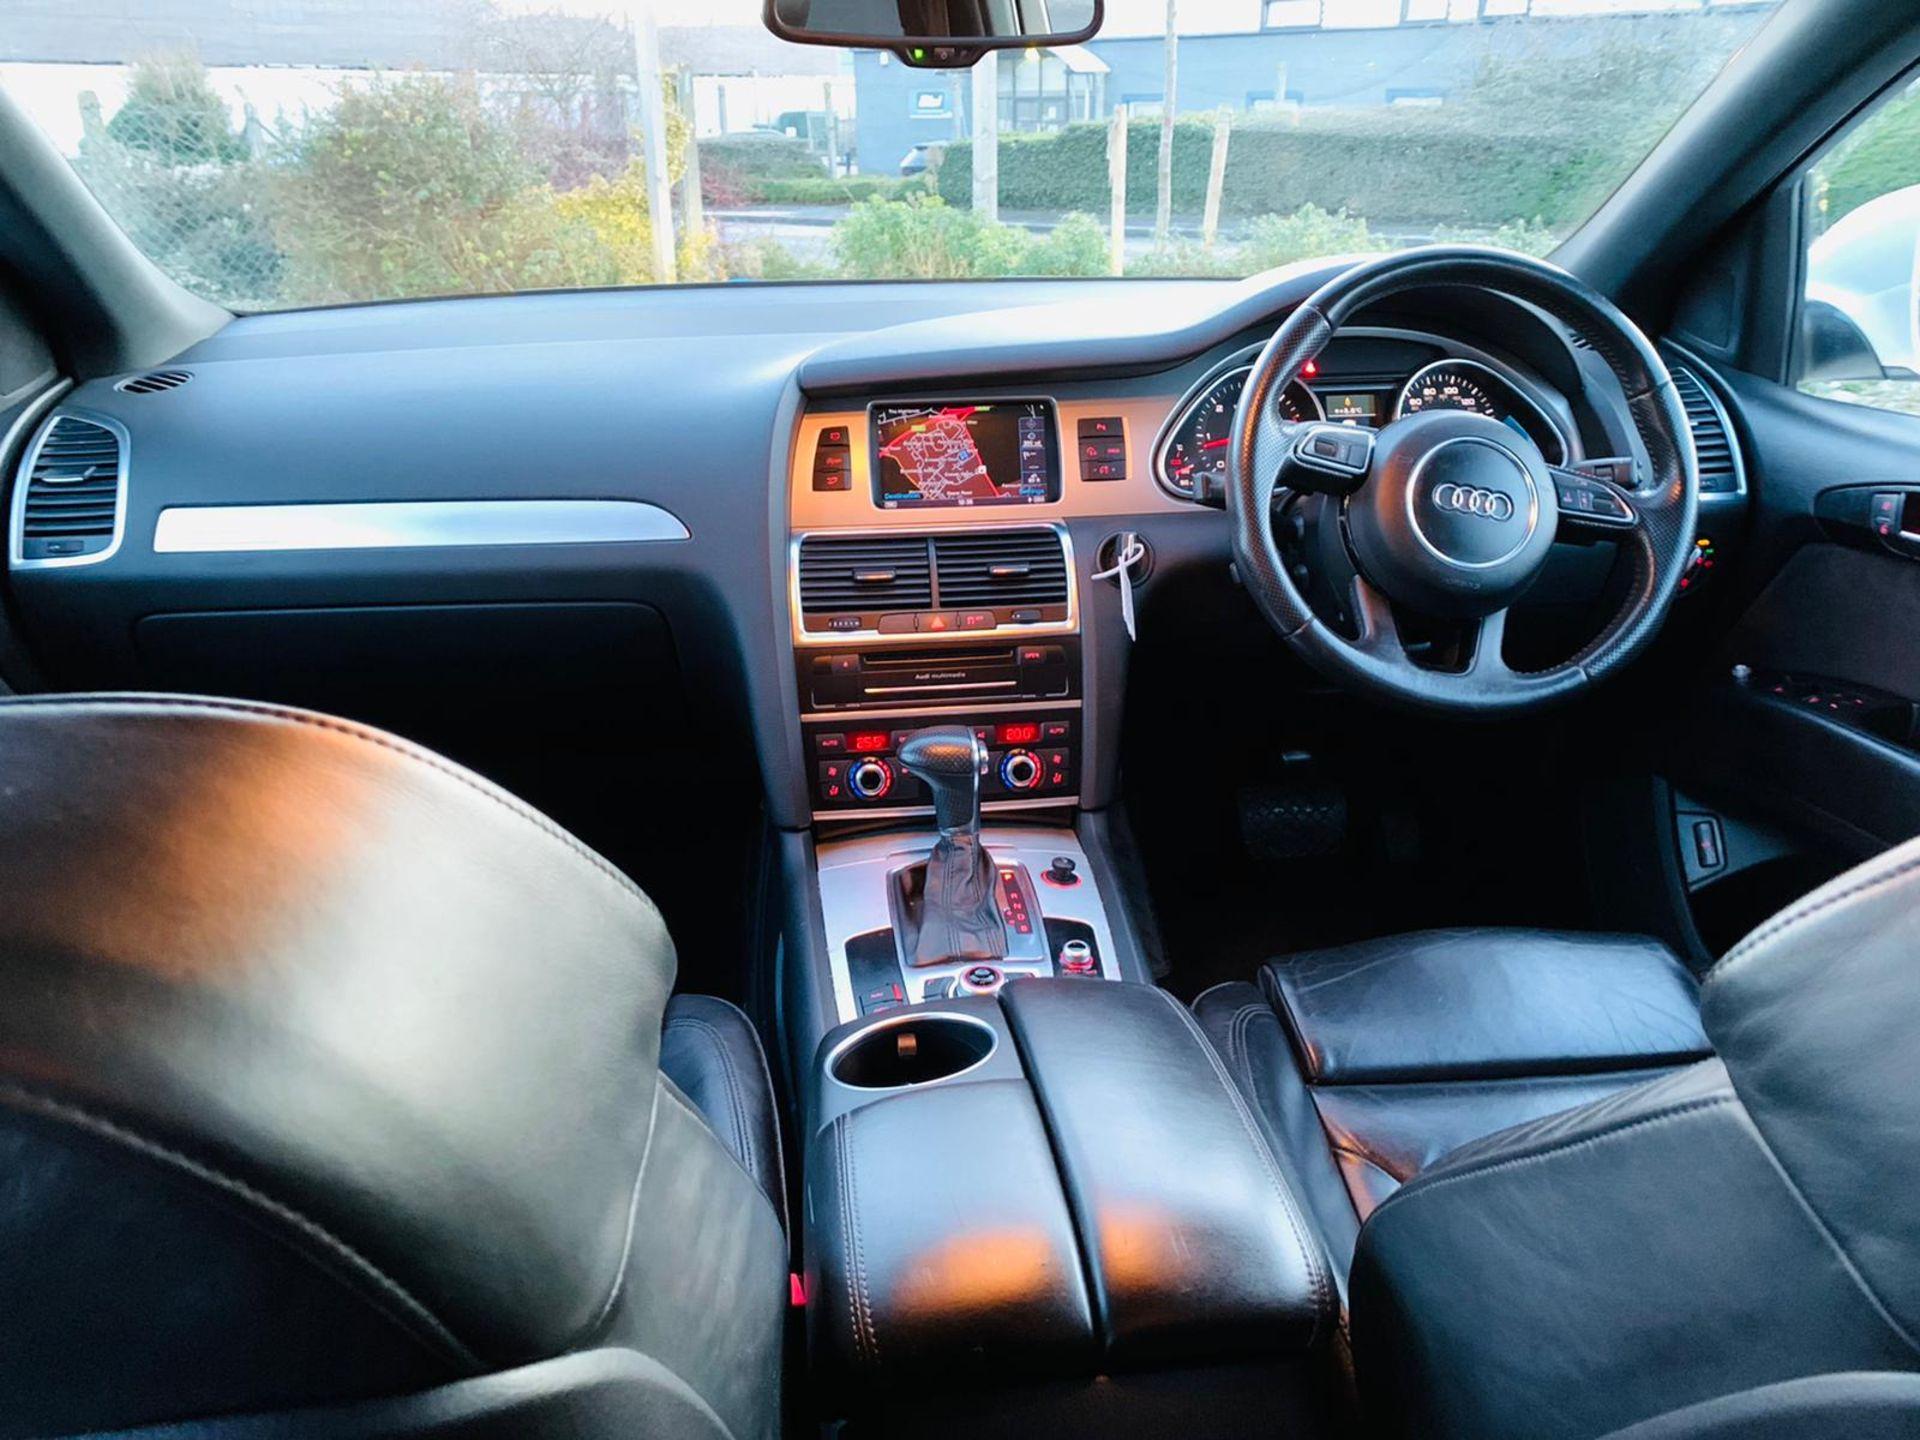 (Reserve Met)Audi Q7 3.0 TDI Quattro S Line Plus Auto (7 Seats) - 12 Reg - Only 63k Miles -Sat Nav- - Image 12 of 37